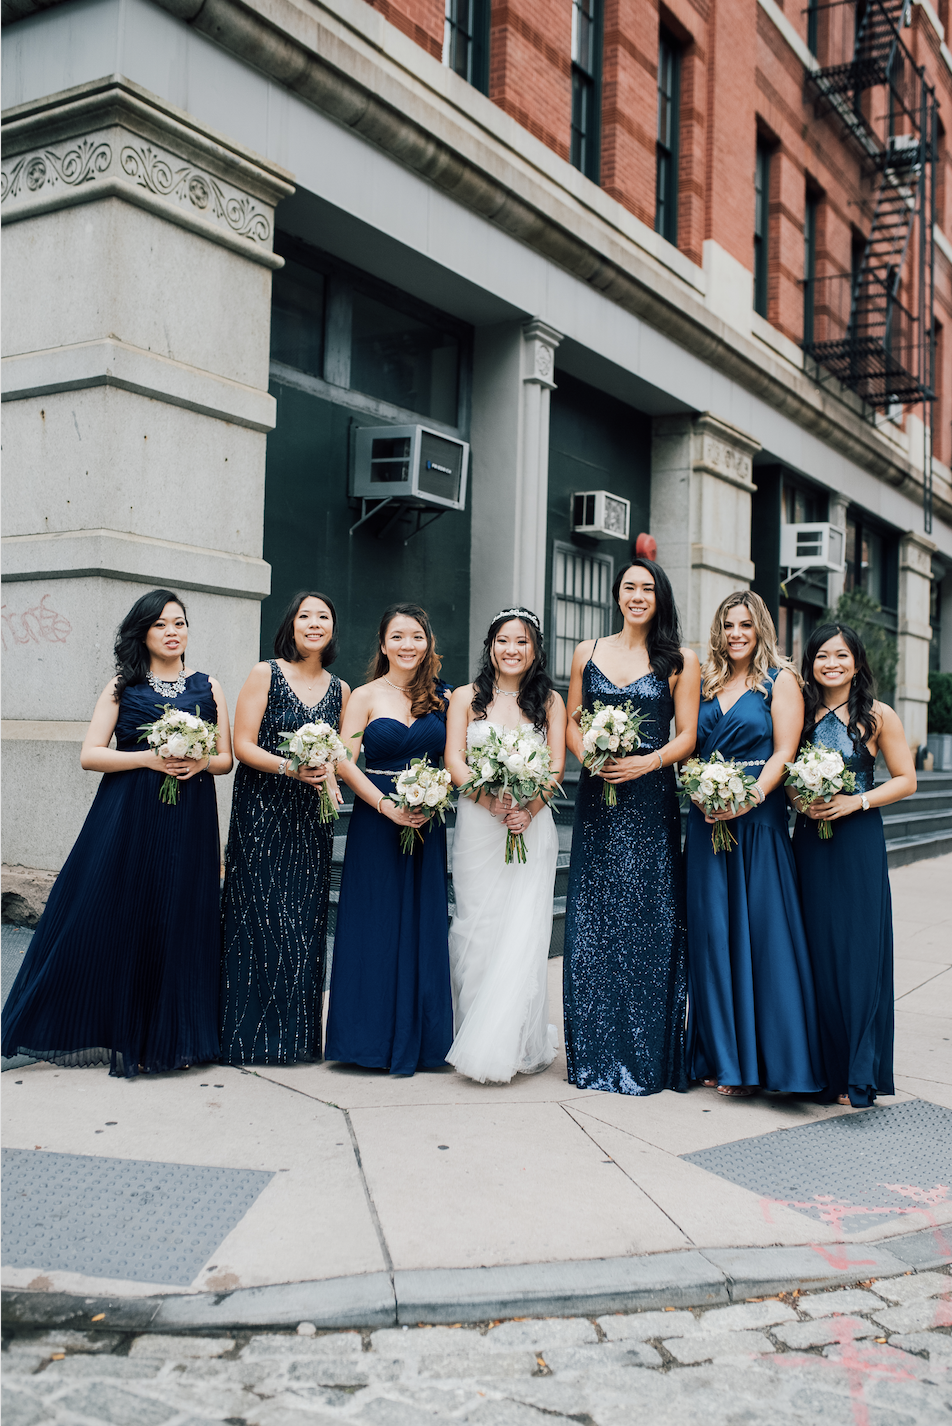 Navy Mismatched Bridesmaids Dresses Fall Wedding Ideas Blue Bridesmaids Dresses Fall Bridesmaid Dresses Navy Blue Bridesmaid Dresses Navy Bridesmaid Dresses [ 1426 x 952 Pixel ]